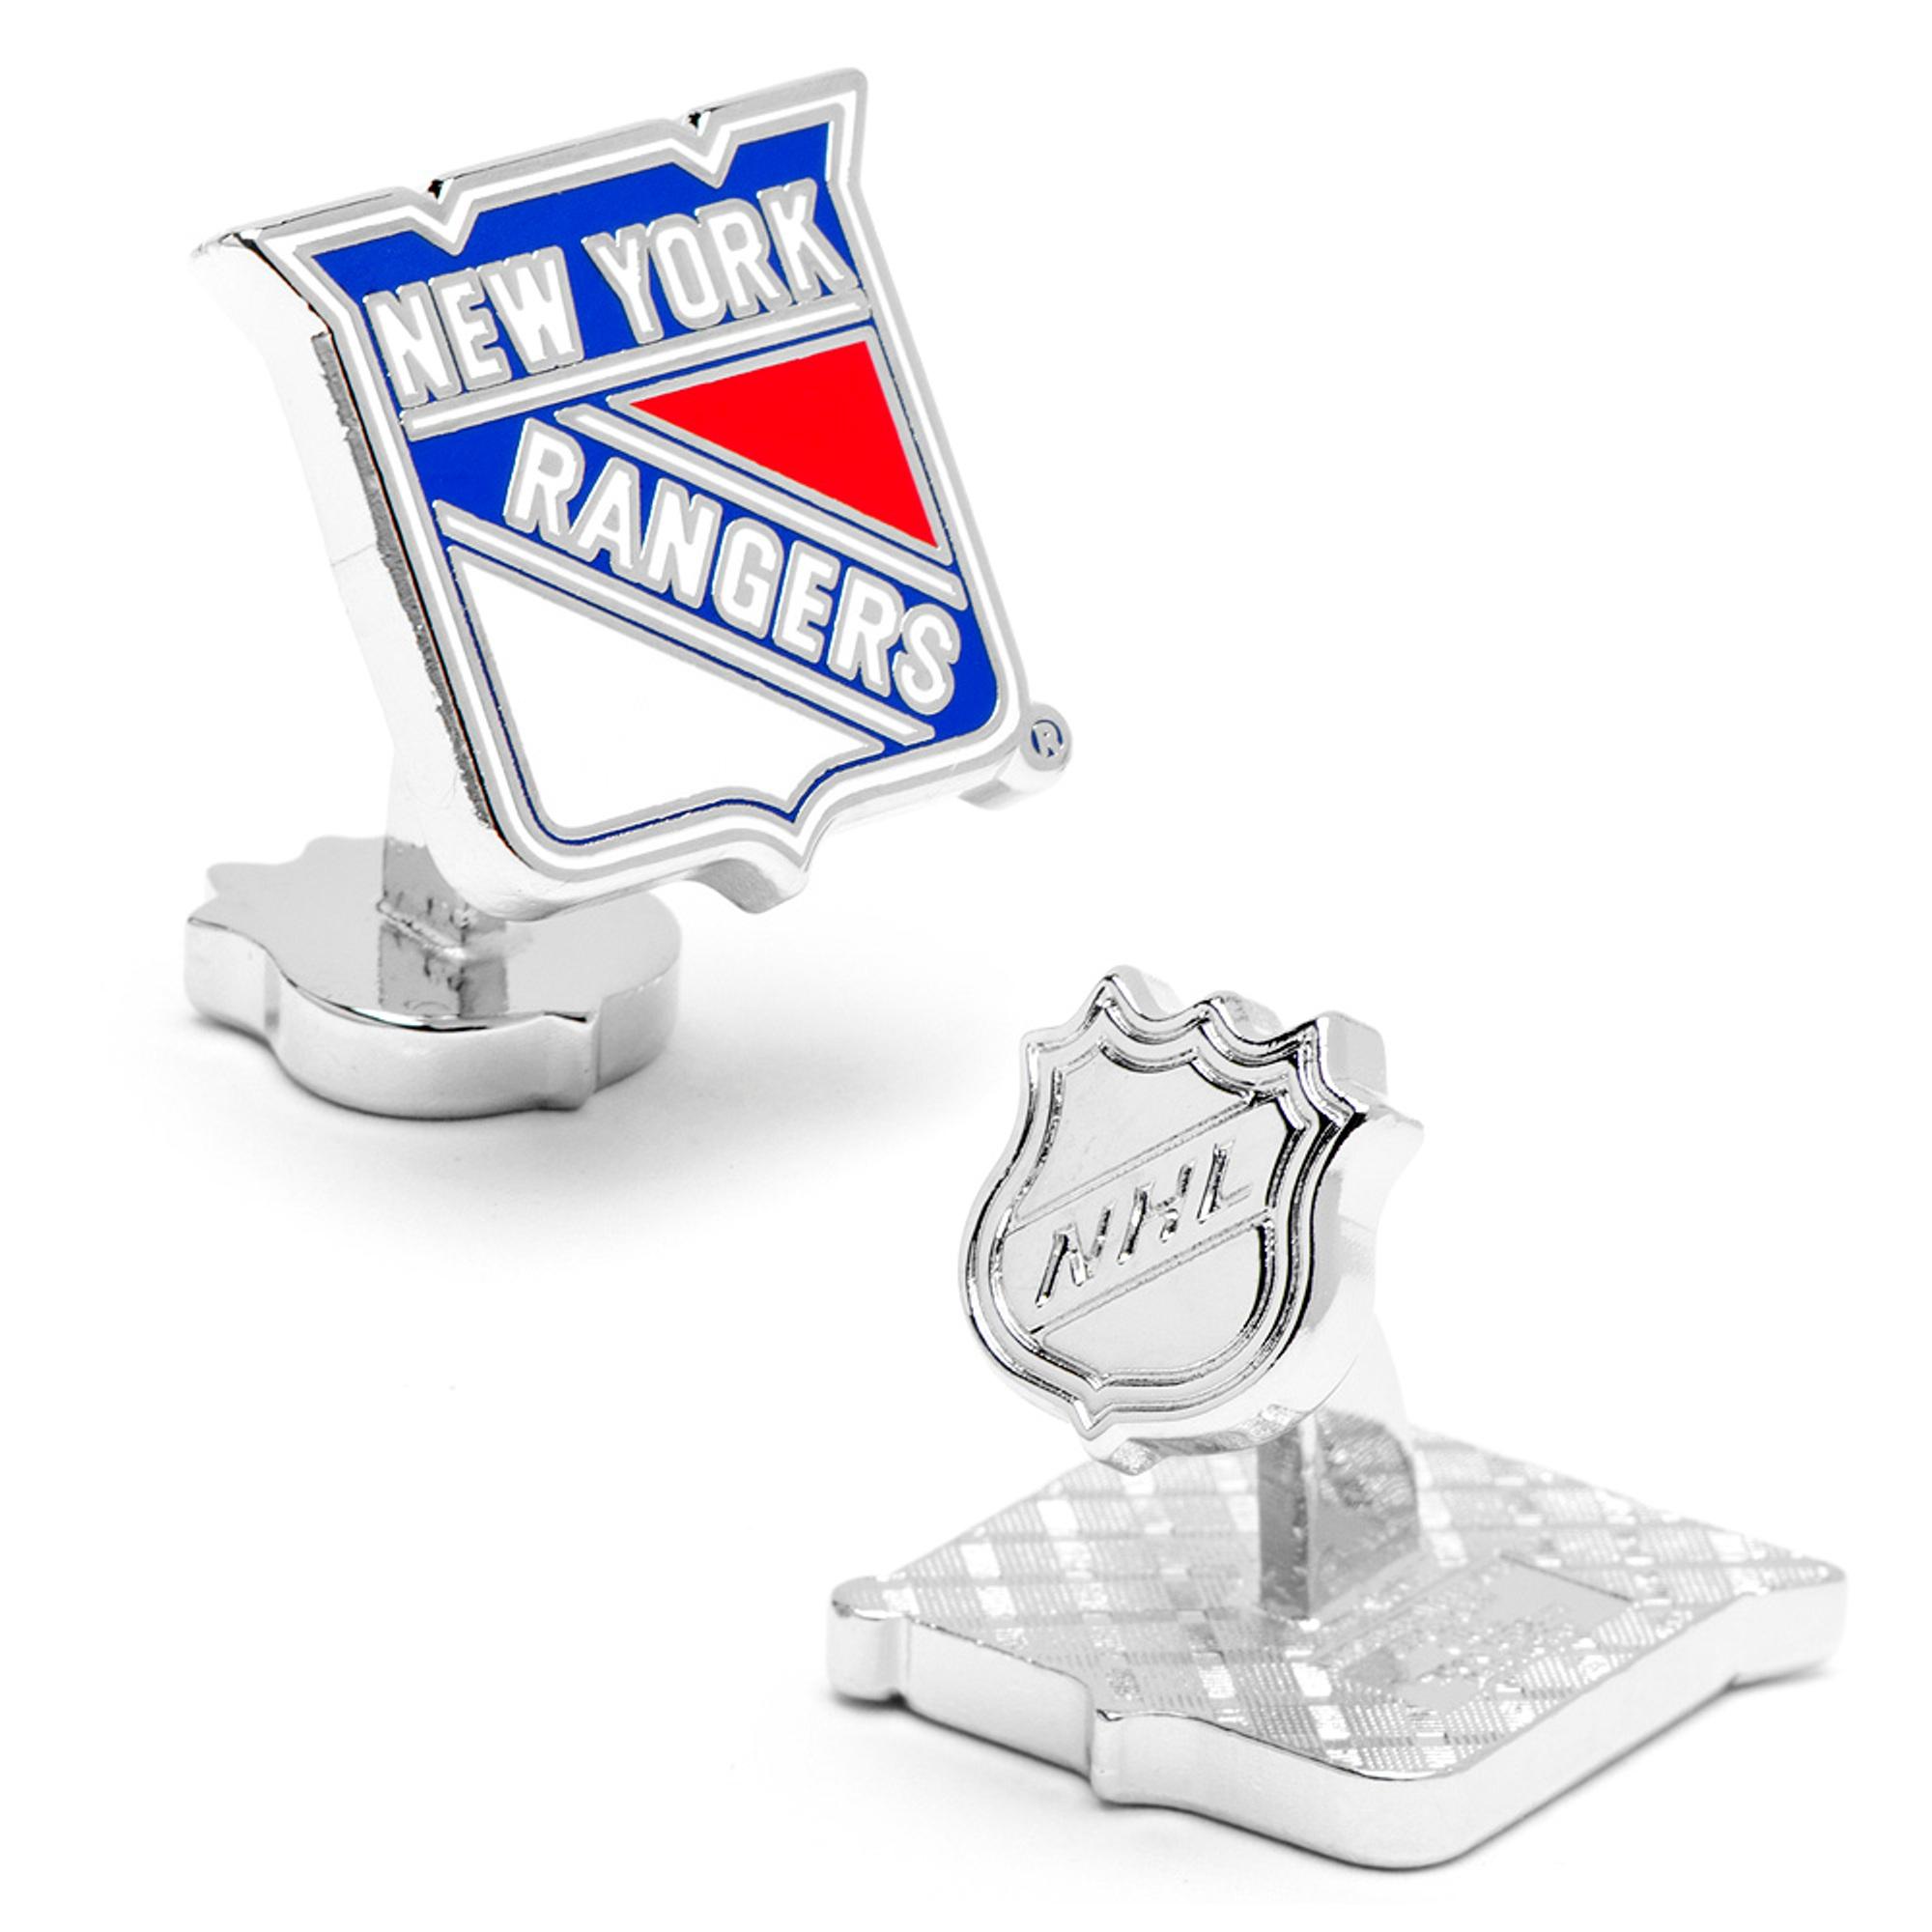 New York Rangers Palladium Cufflinks